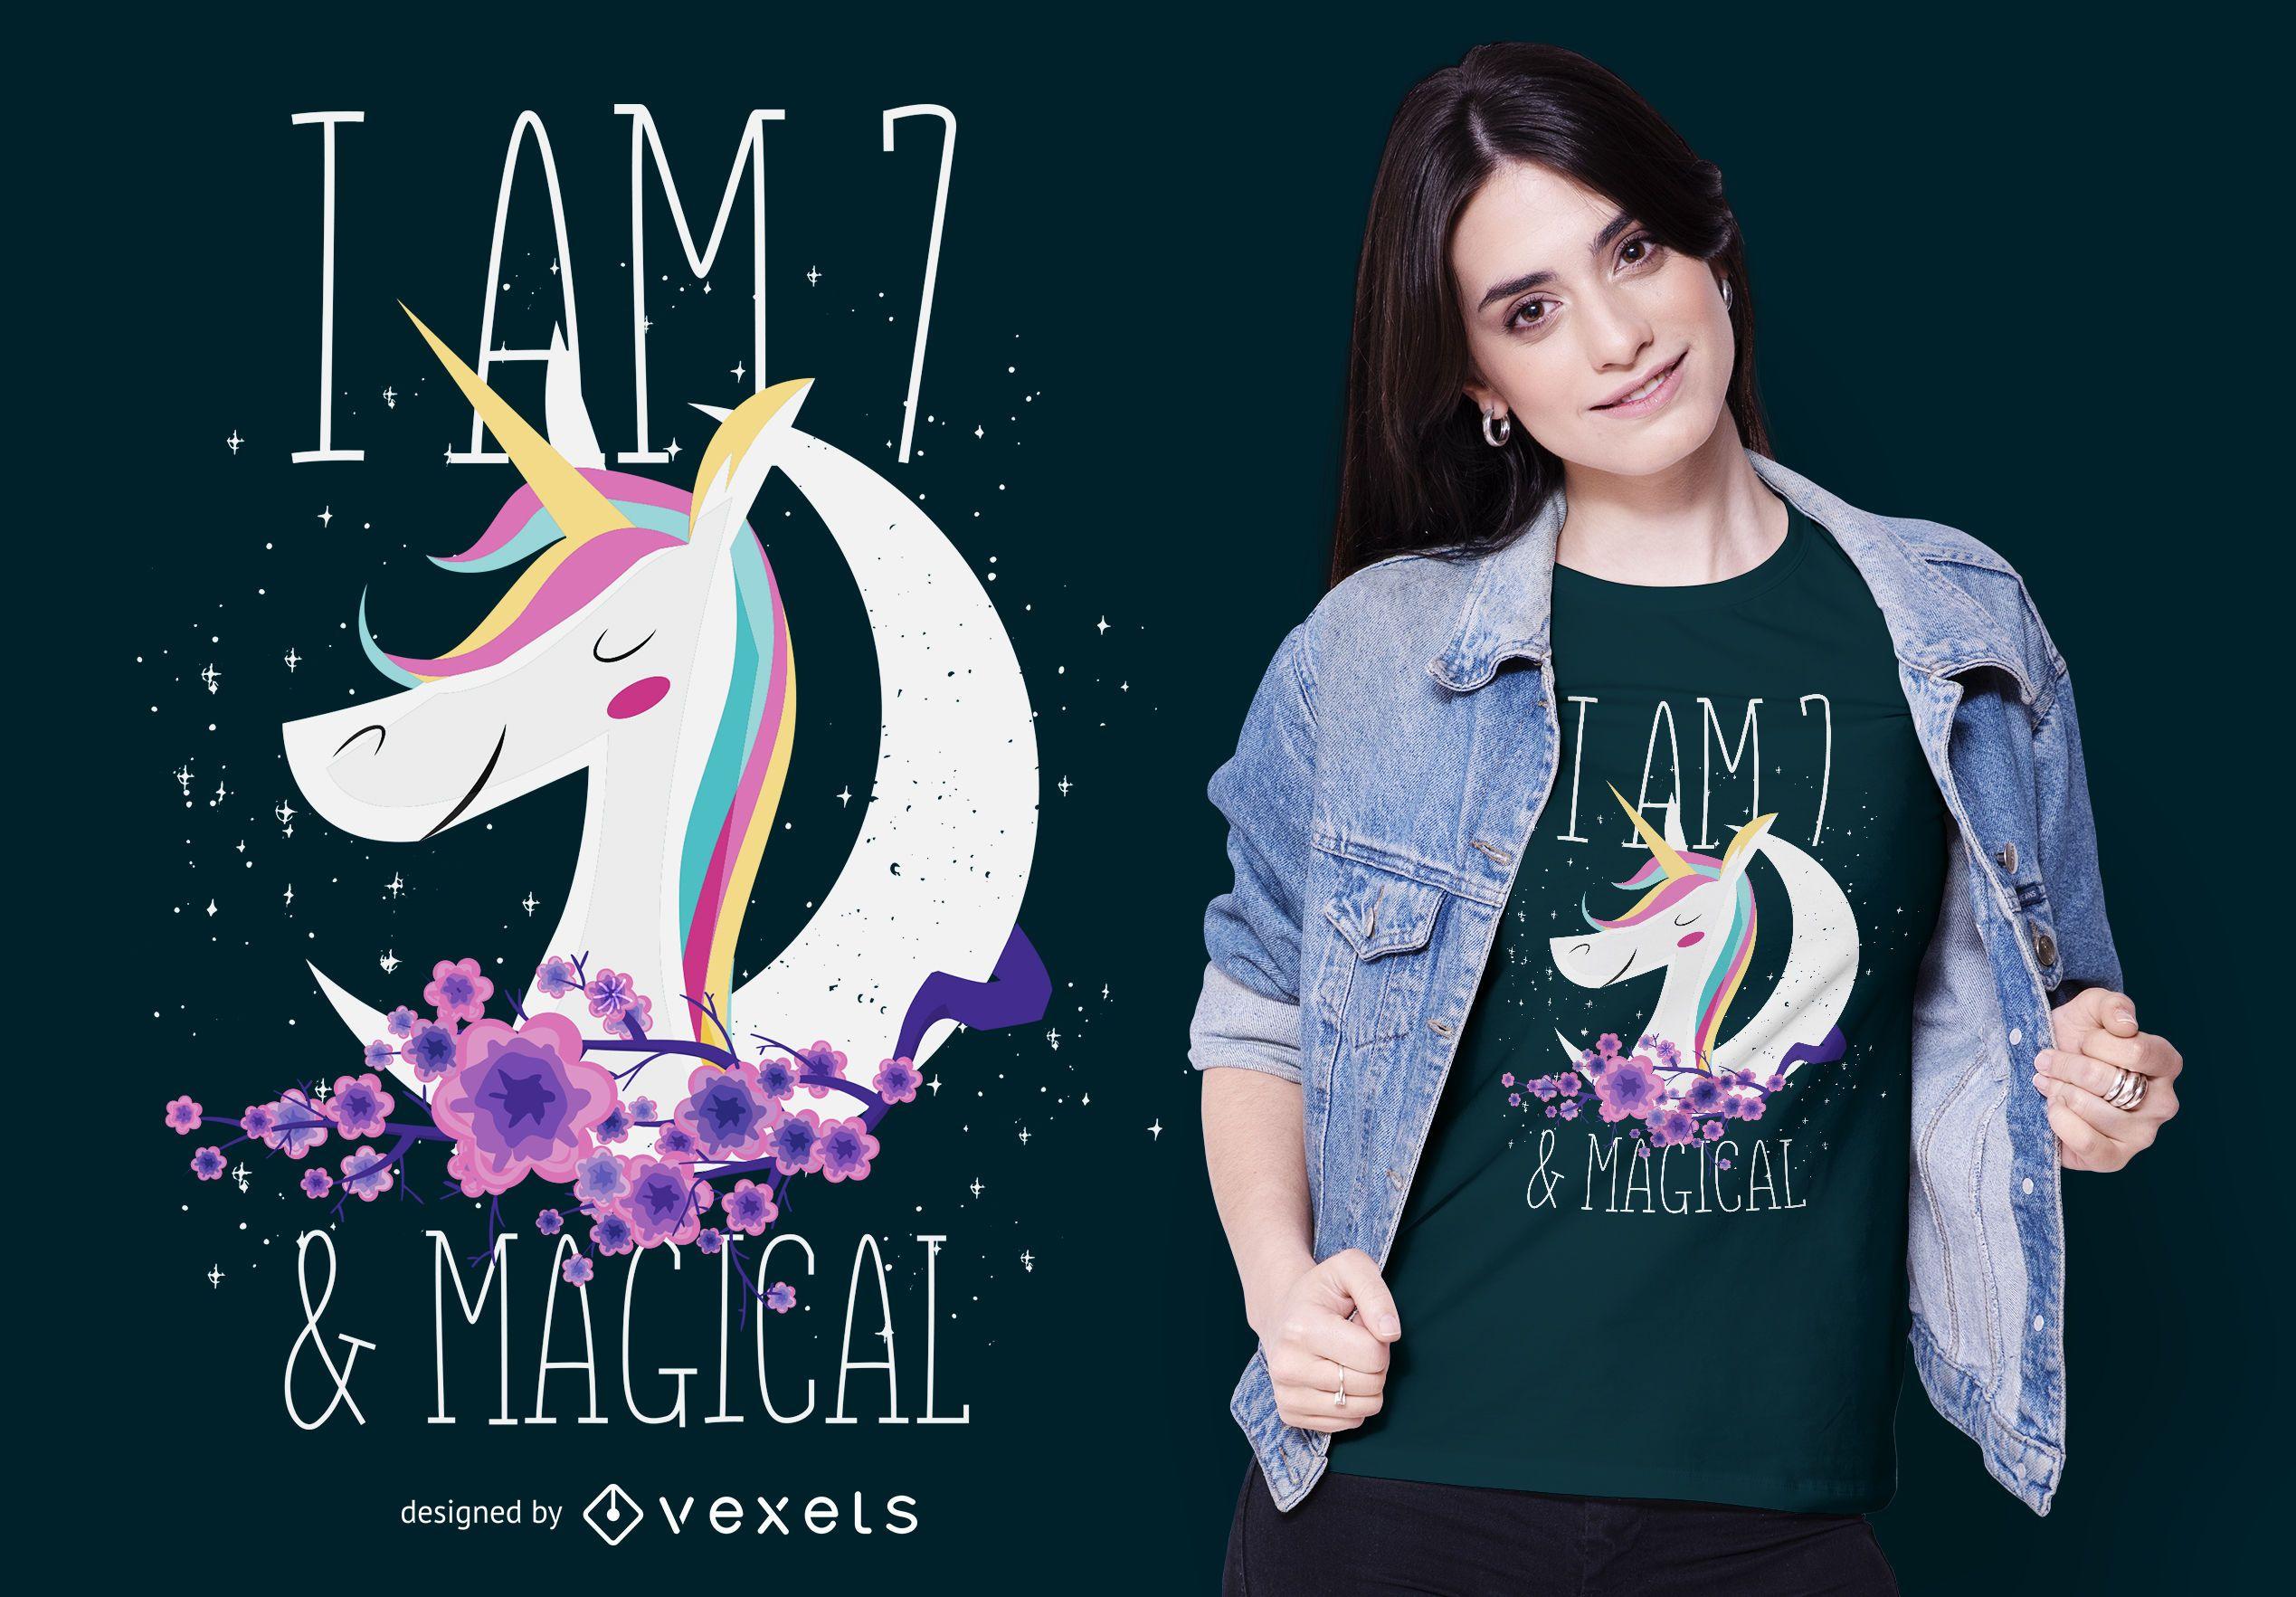 7 years-old Unicorn T-shirt Design